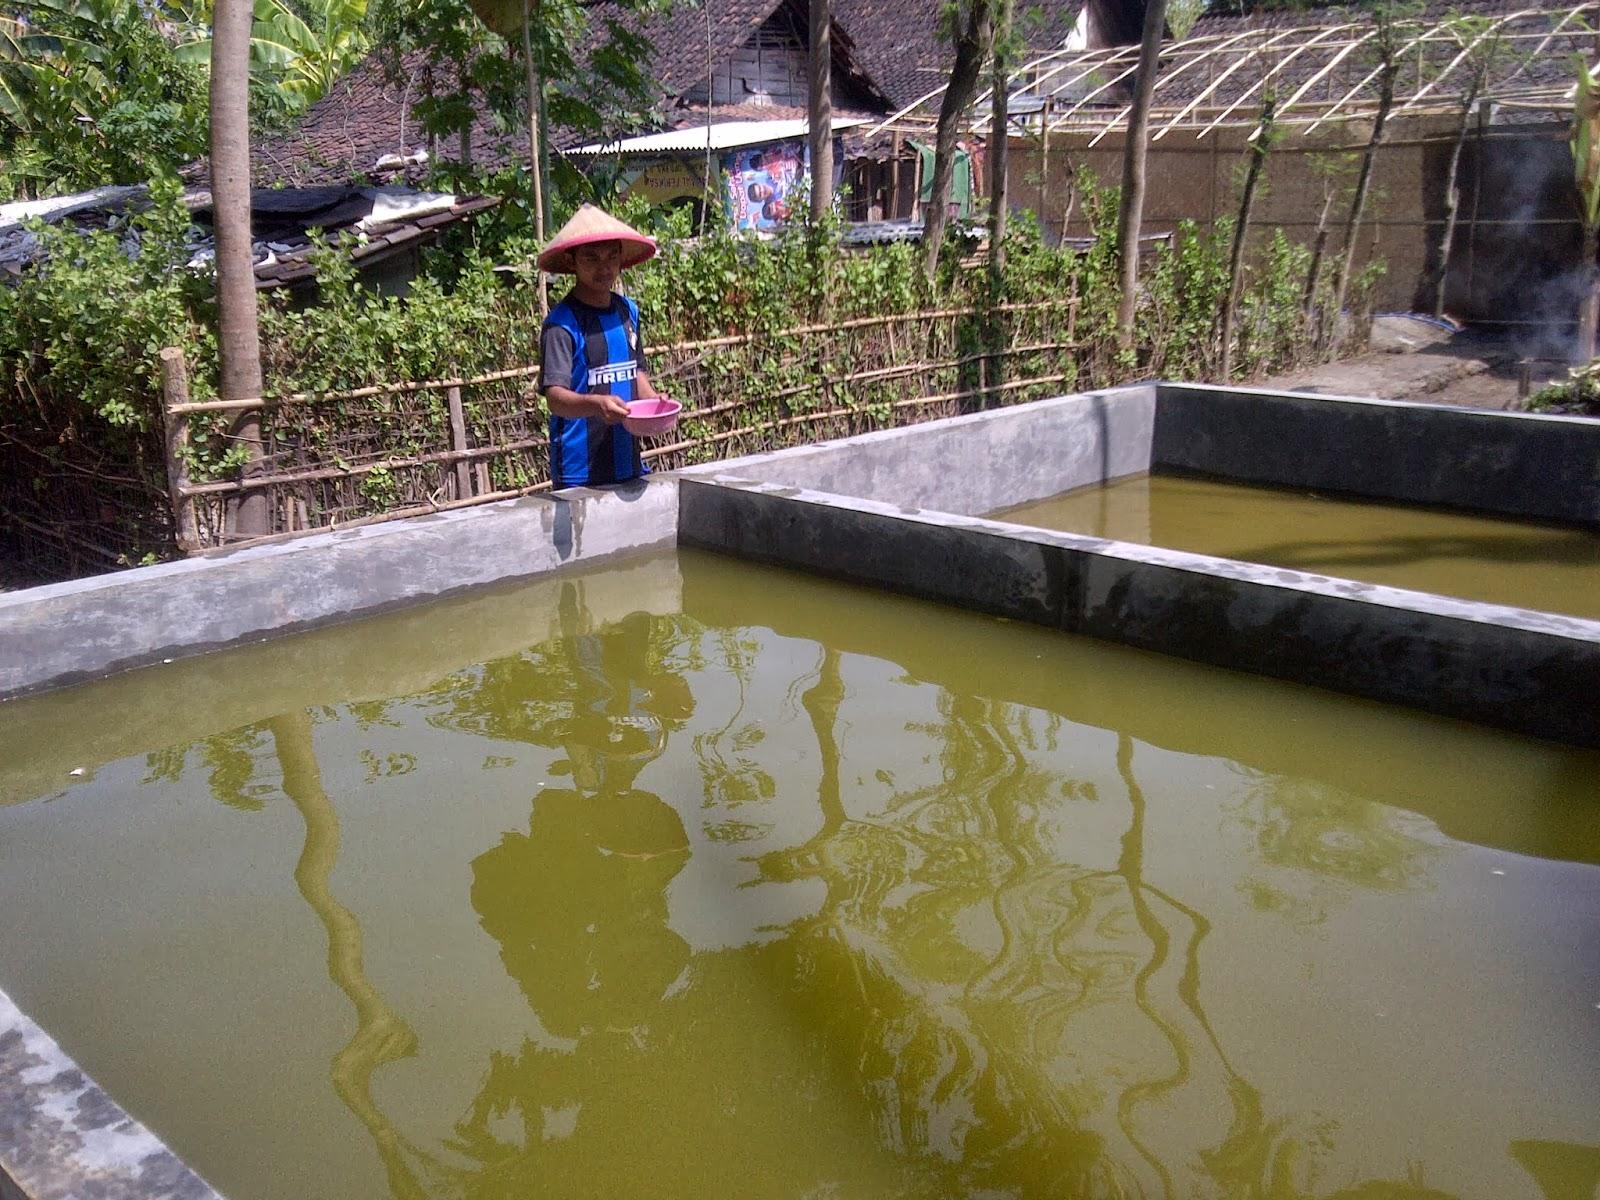 Perikanan Dari Pemuda Kreatif Bojonegoro Didik Setiawan Pelet Ikan 781 Eceran 1 Kg Peternak Beri Pakan Mimpi